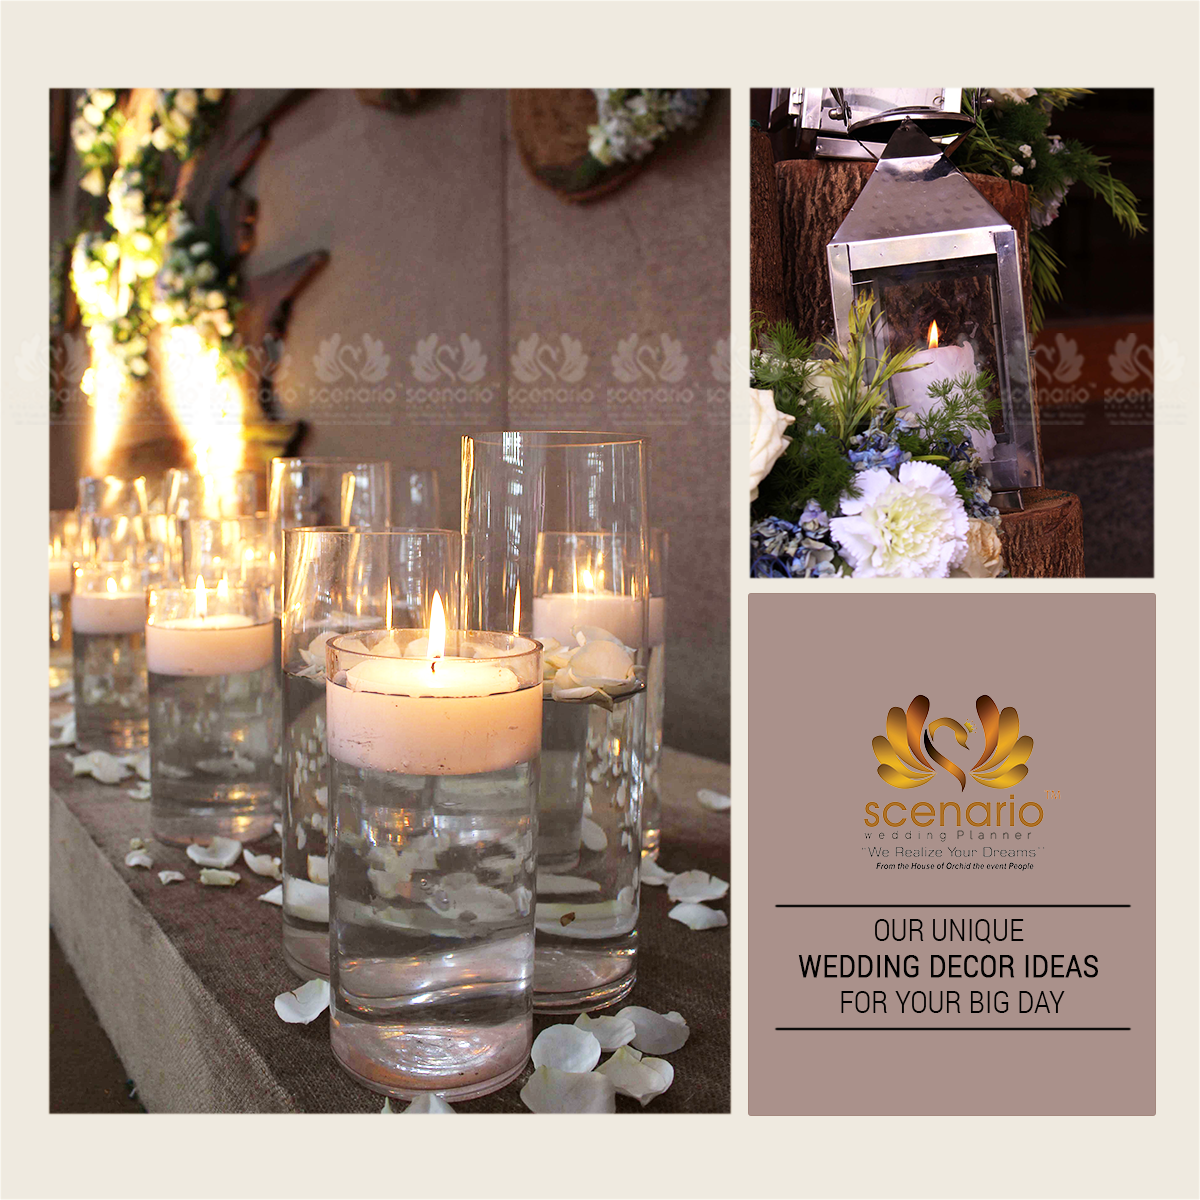 Our Unique Wedding Decor Ideas For Your Day Scenario Planner Contact